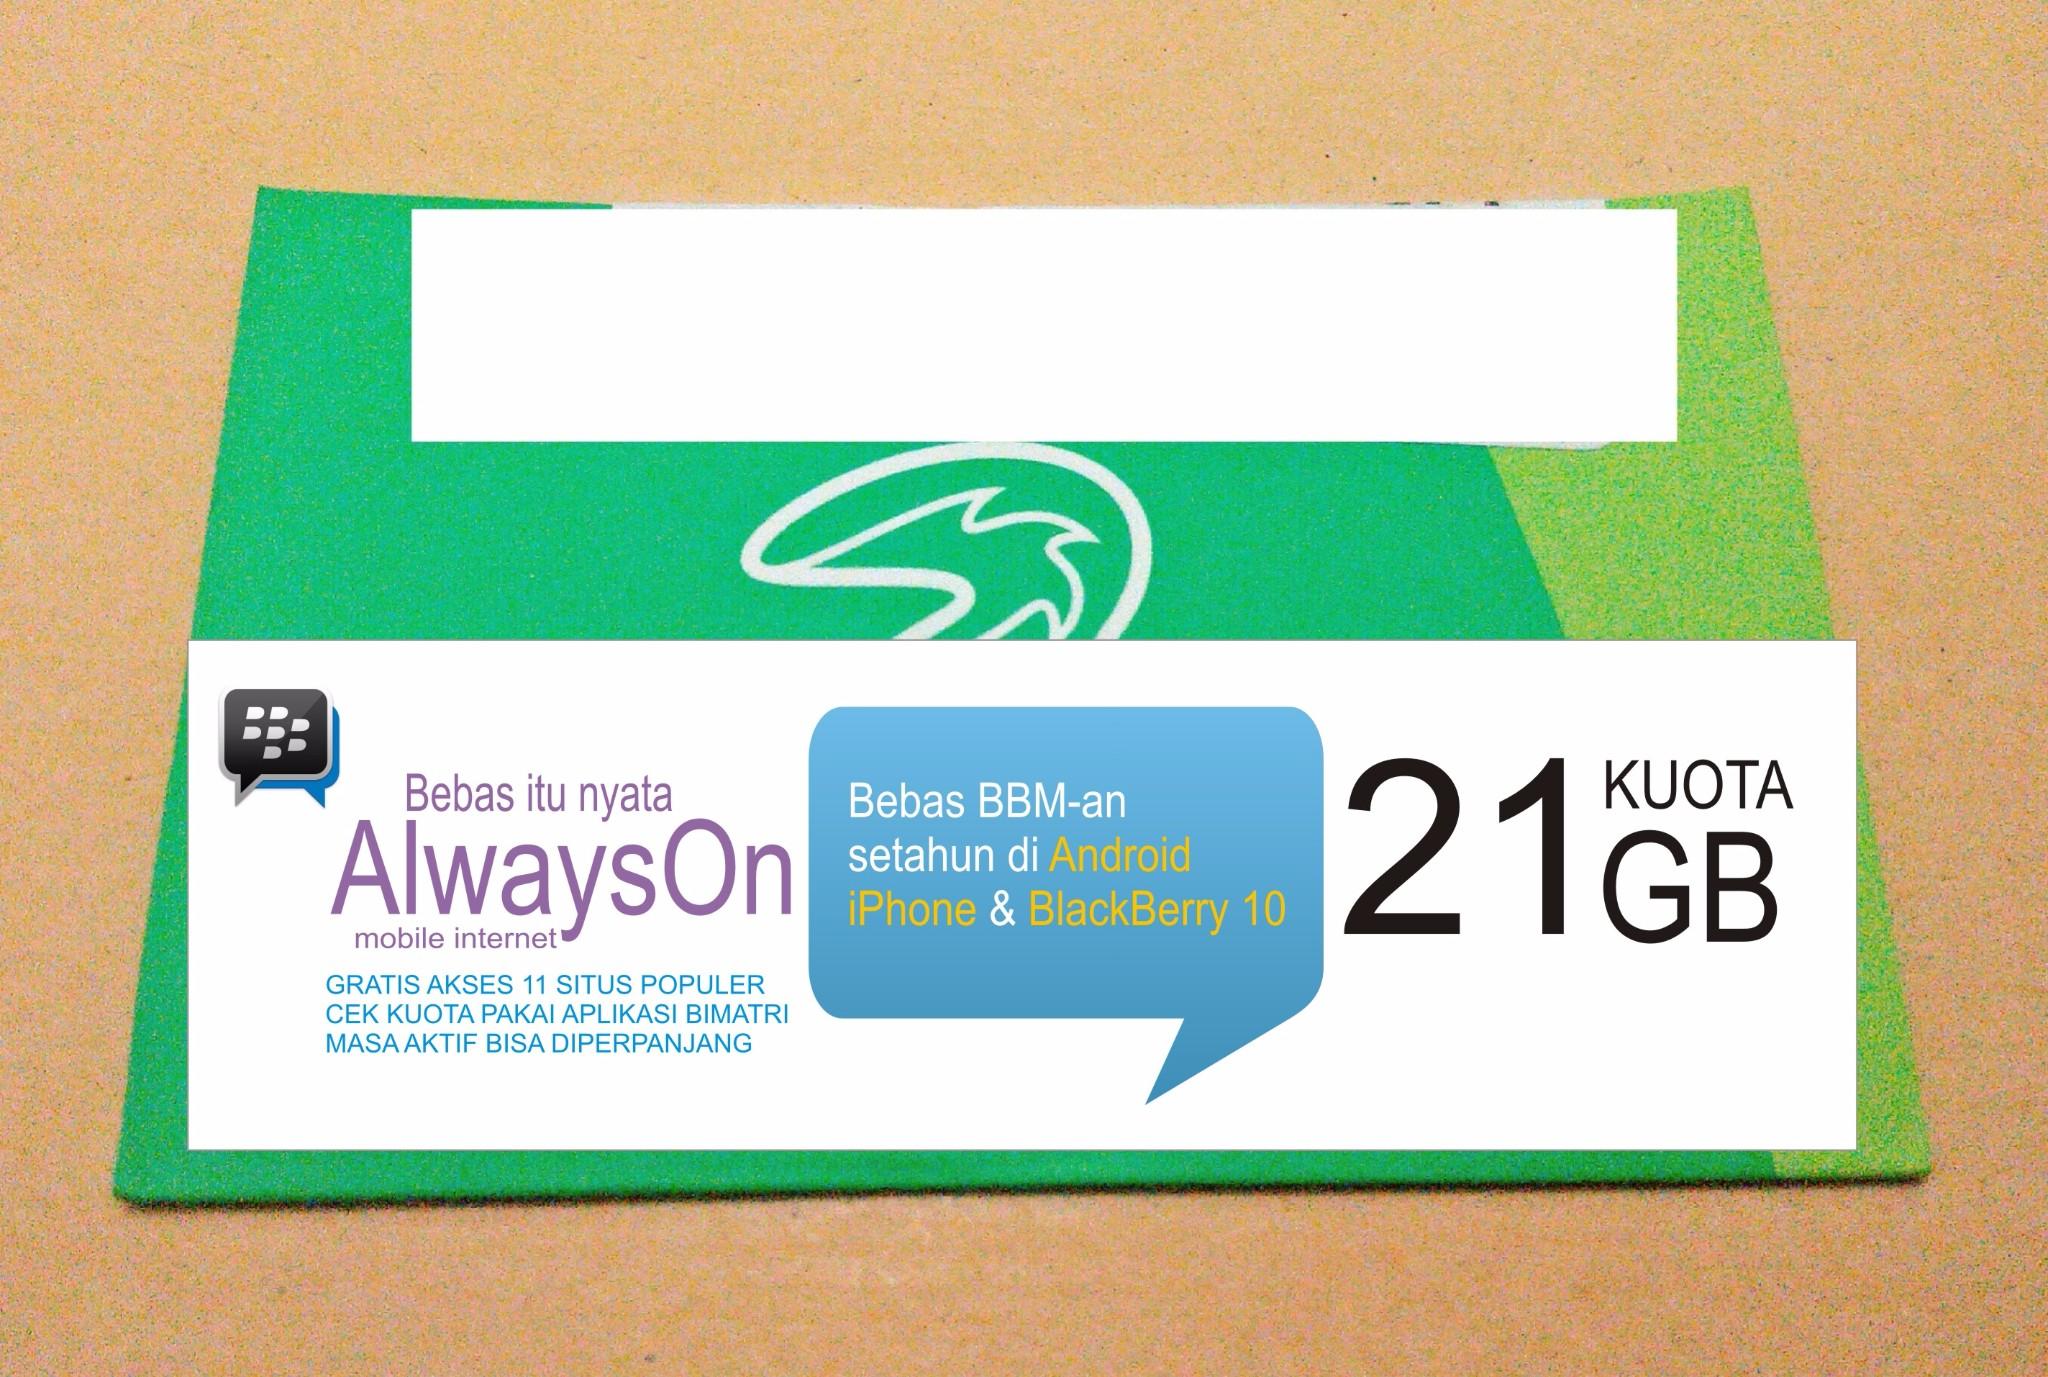 harga Kartu Perdana Internet Tri 3 Three Aon  21GB 21 GB Tahun Tokopedia.com